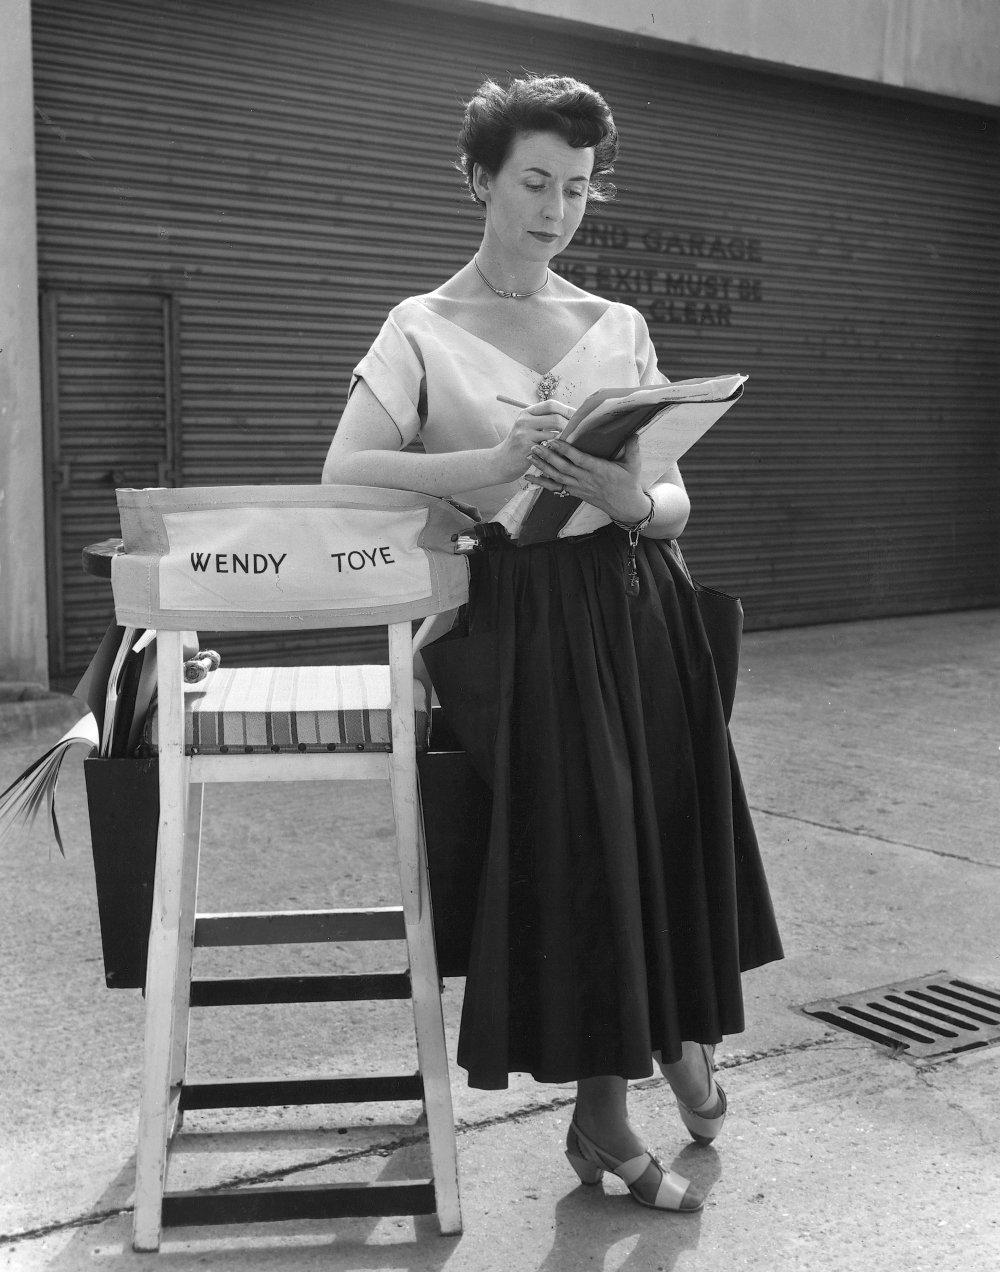 British dancer, actress, theatre and film director Wendy Toye